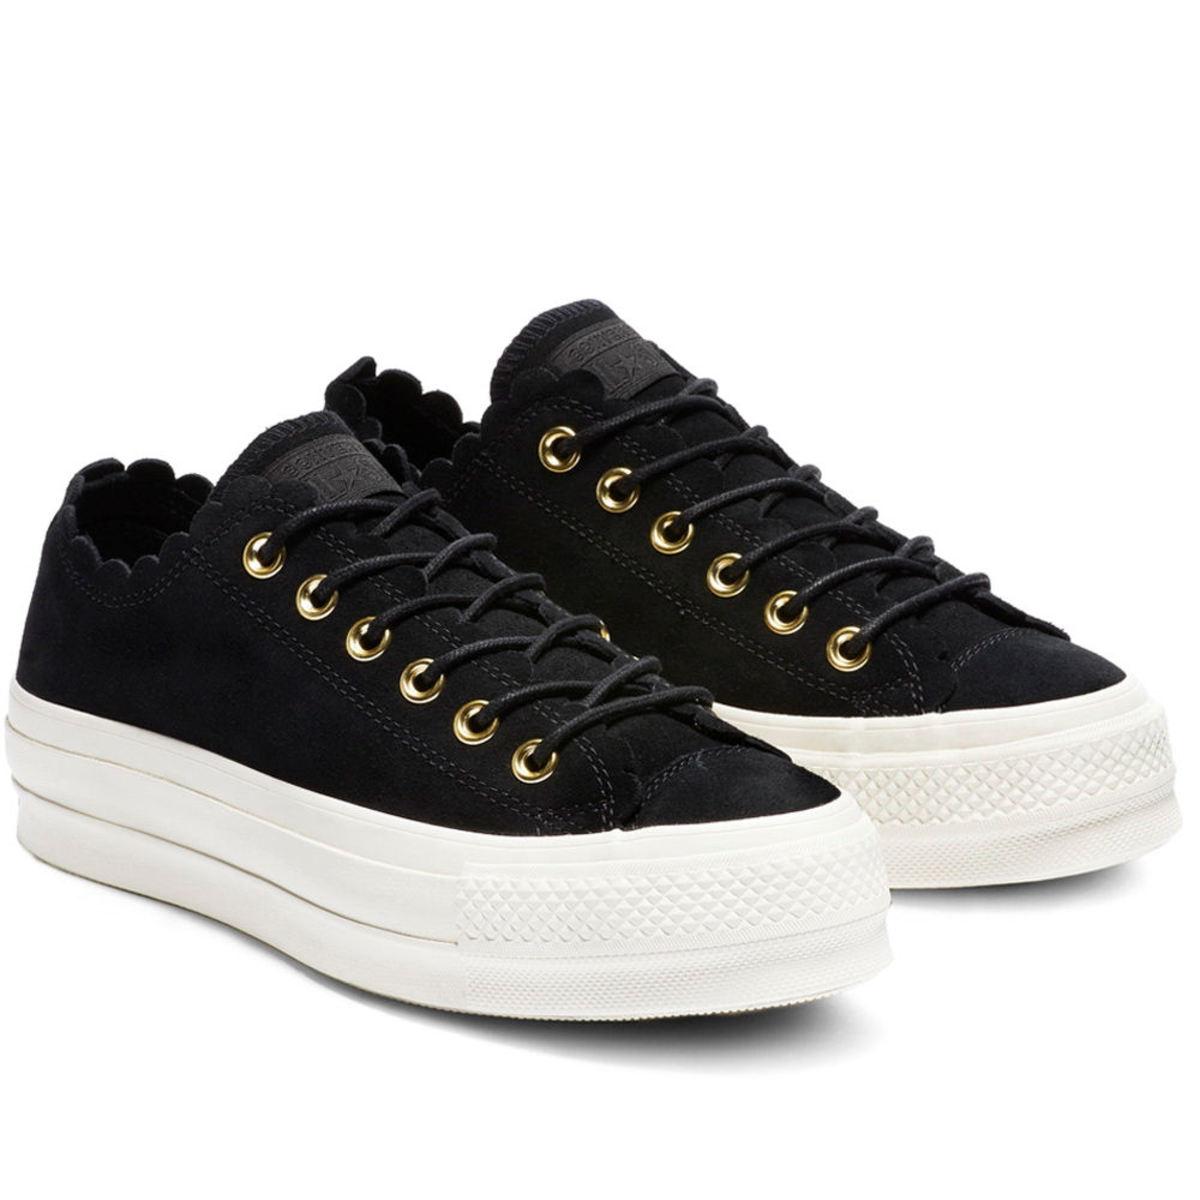 c132a39fee topánky dámske CONVERSE - CTAS LIFT OX - BLACK   GOLD   Egret ...